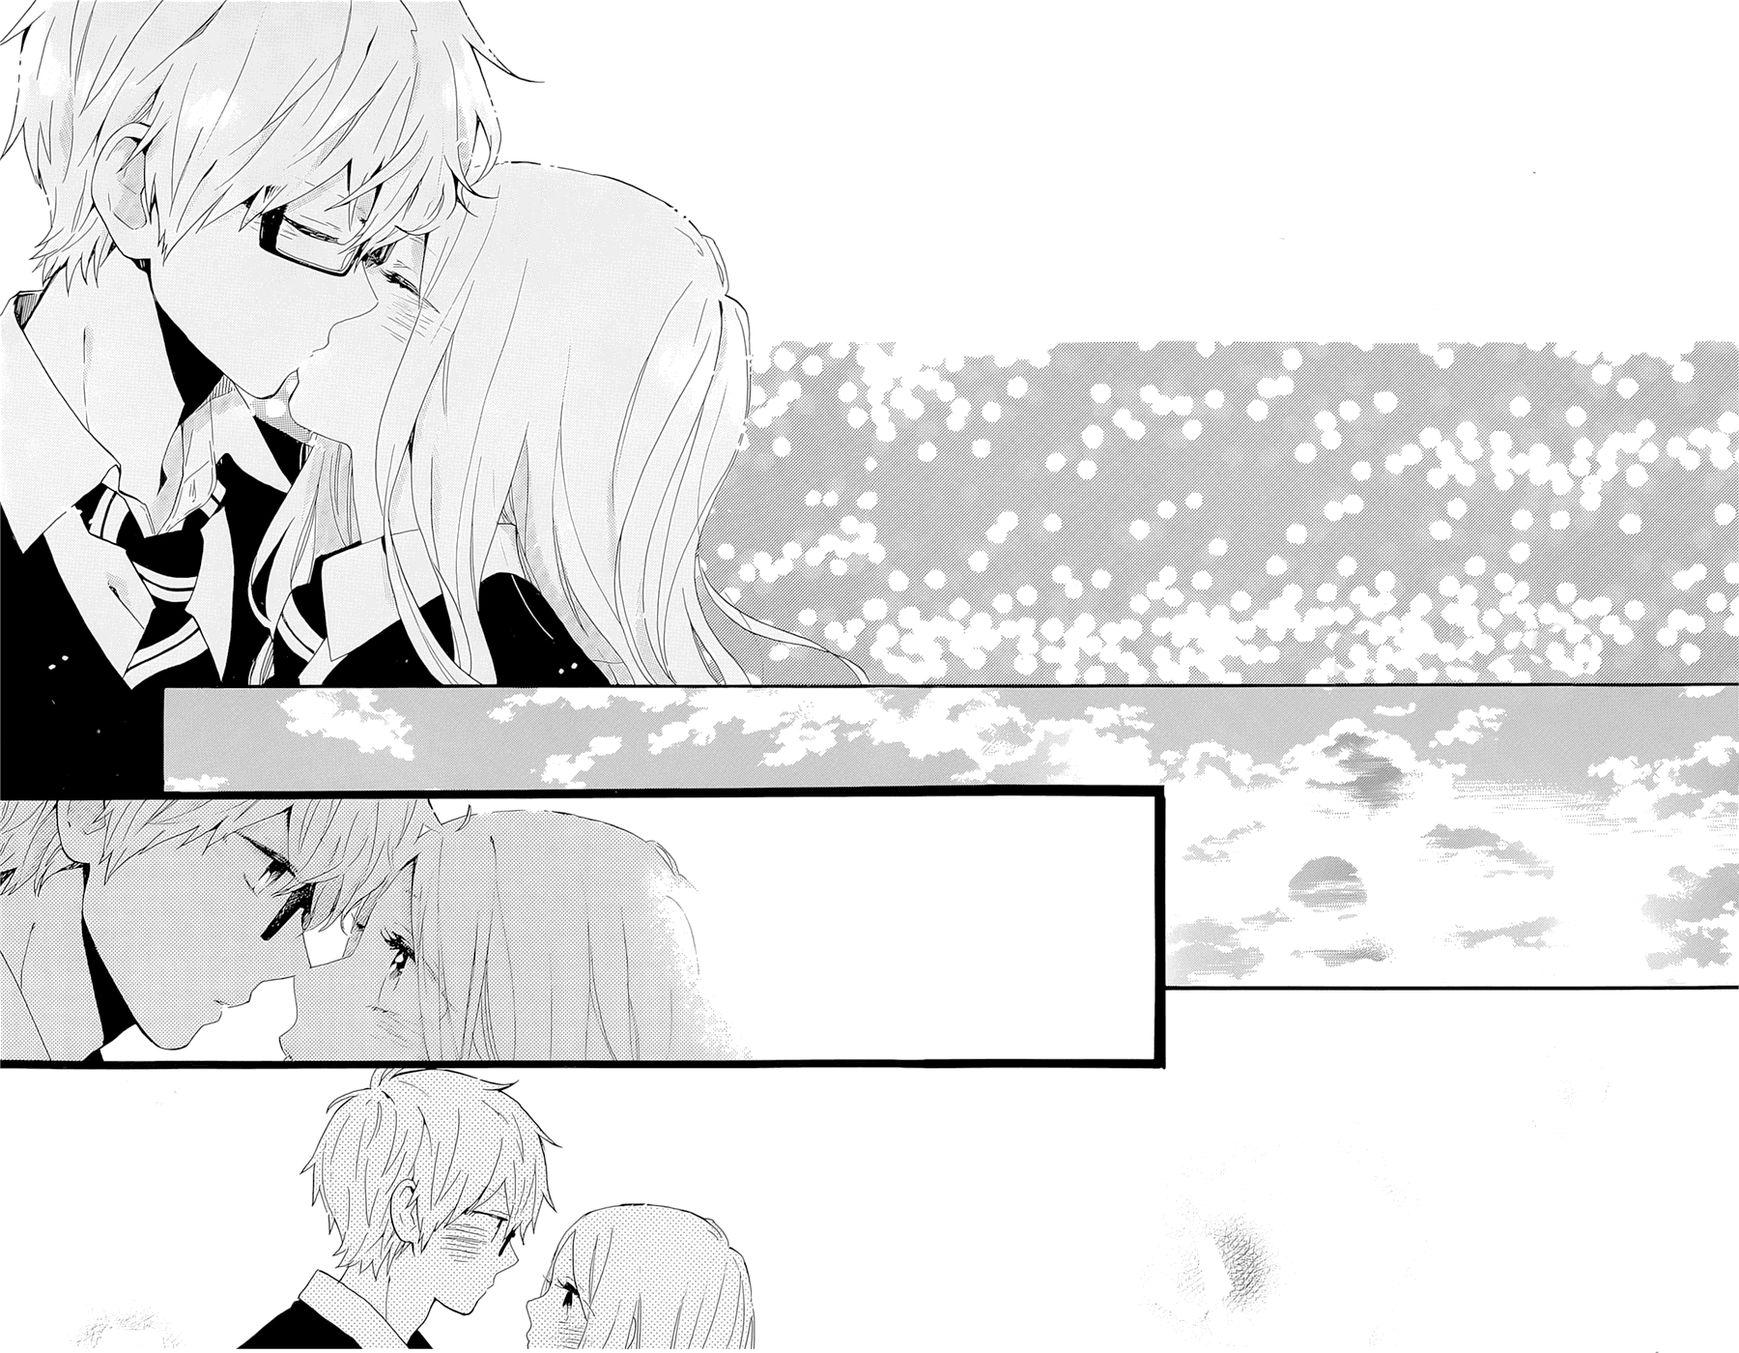 Shokugeki no Soma 133.1 Page 1